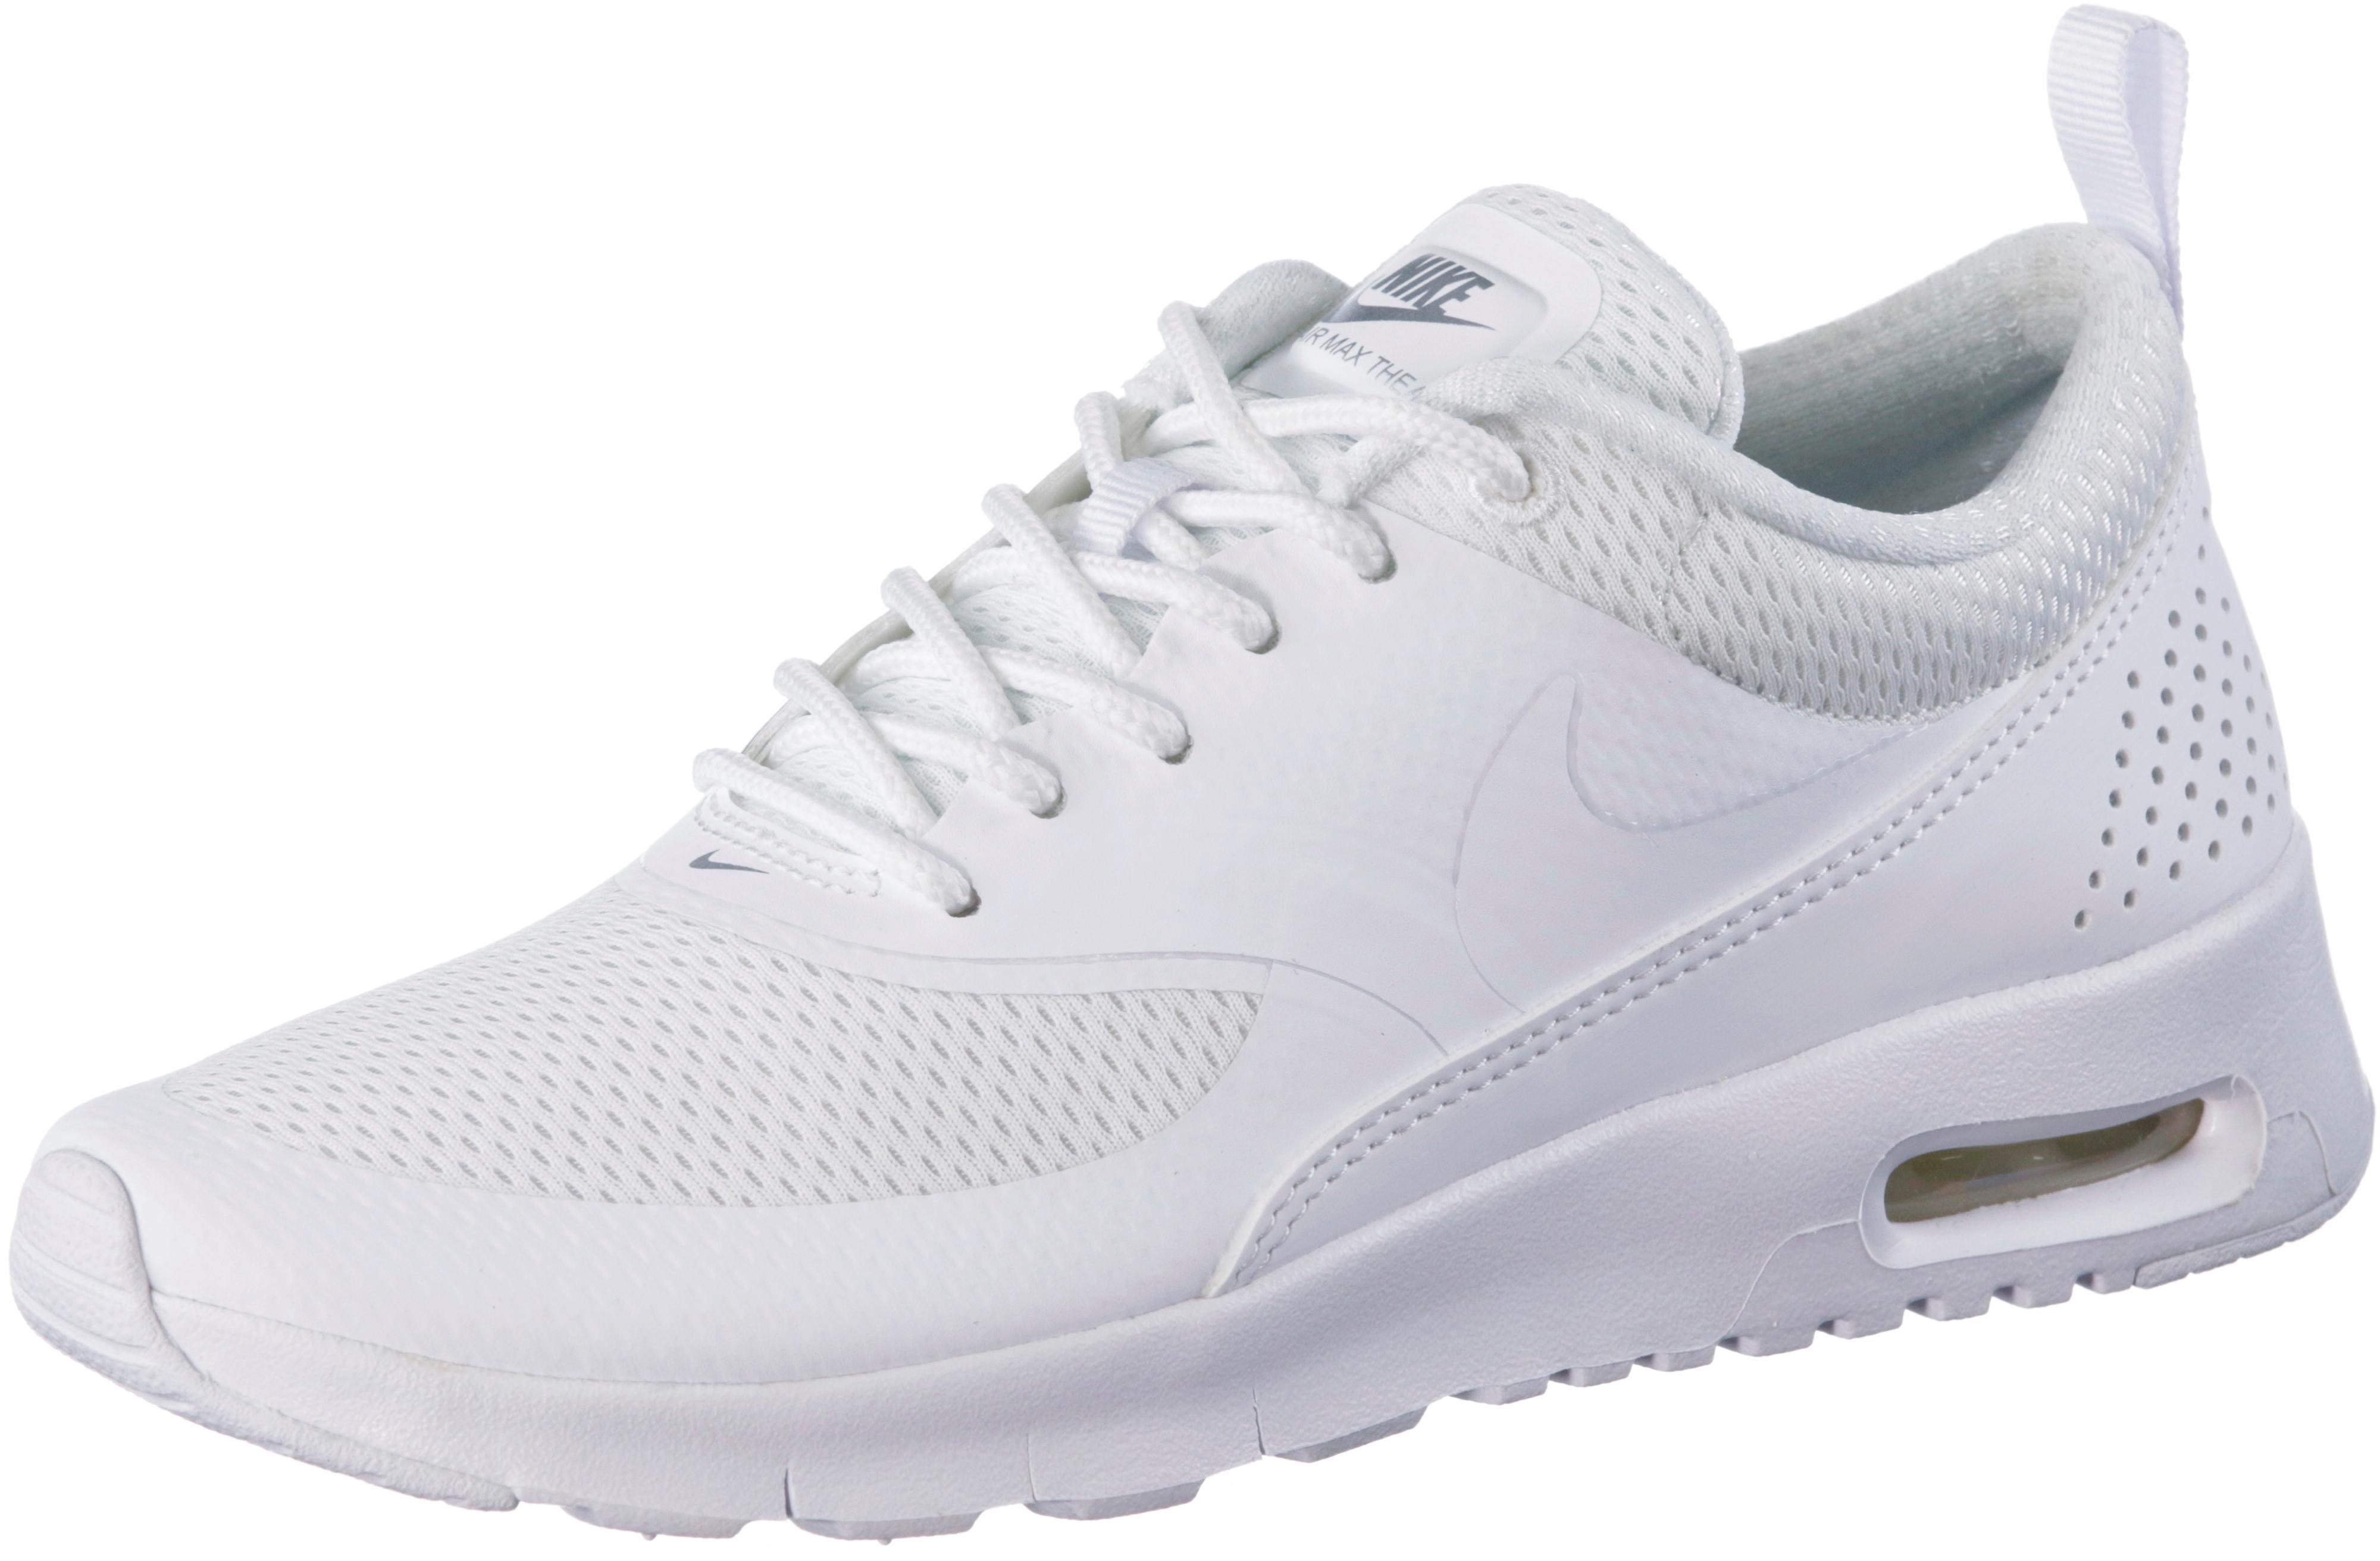 Großhandel Nike Air Max Thea Größe 35 aktion zahF06Bb easy